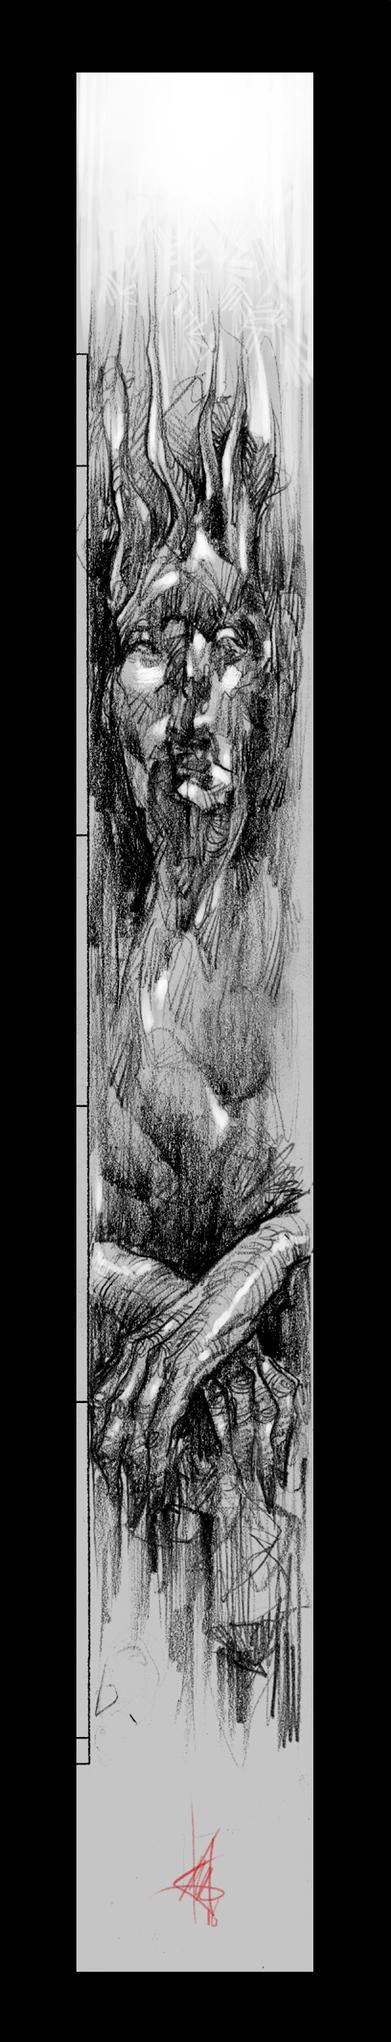 Deity by Chaosmember